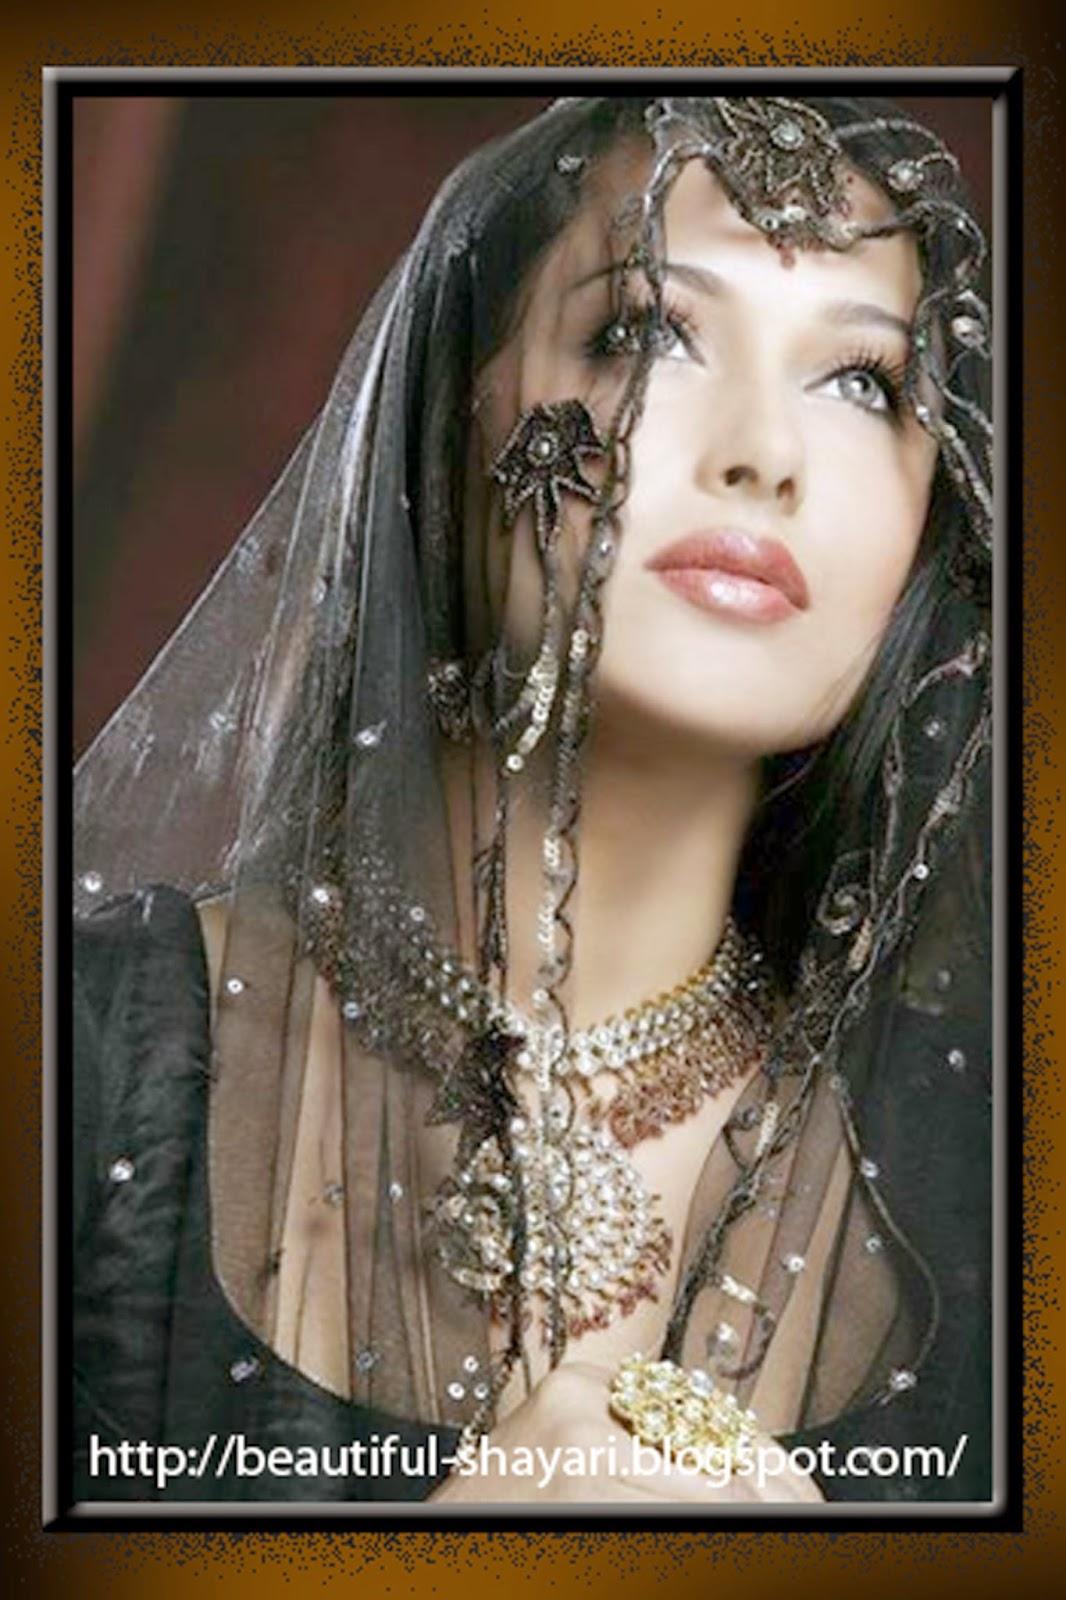 http://2.bp.blogspot.com/-VOkgNzzkGpY/U95cYajljAI/AAAAAAAADf4/HiTvrLHNZtU/s1600/Us+Hussan+K+Sachhe+Moti+Ko+Beautiful+Shayari.jpg